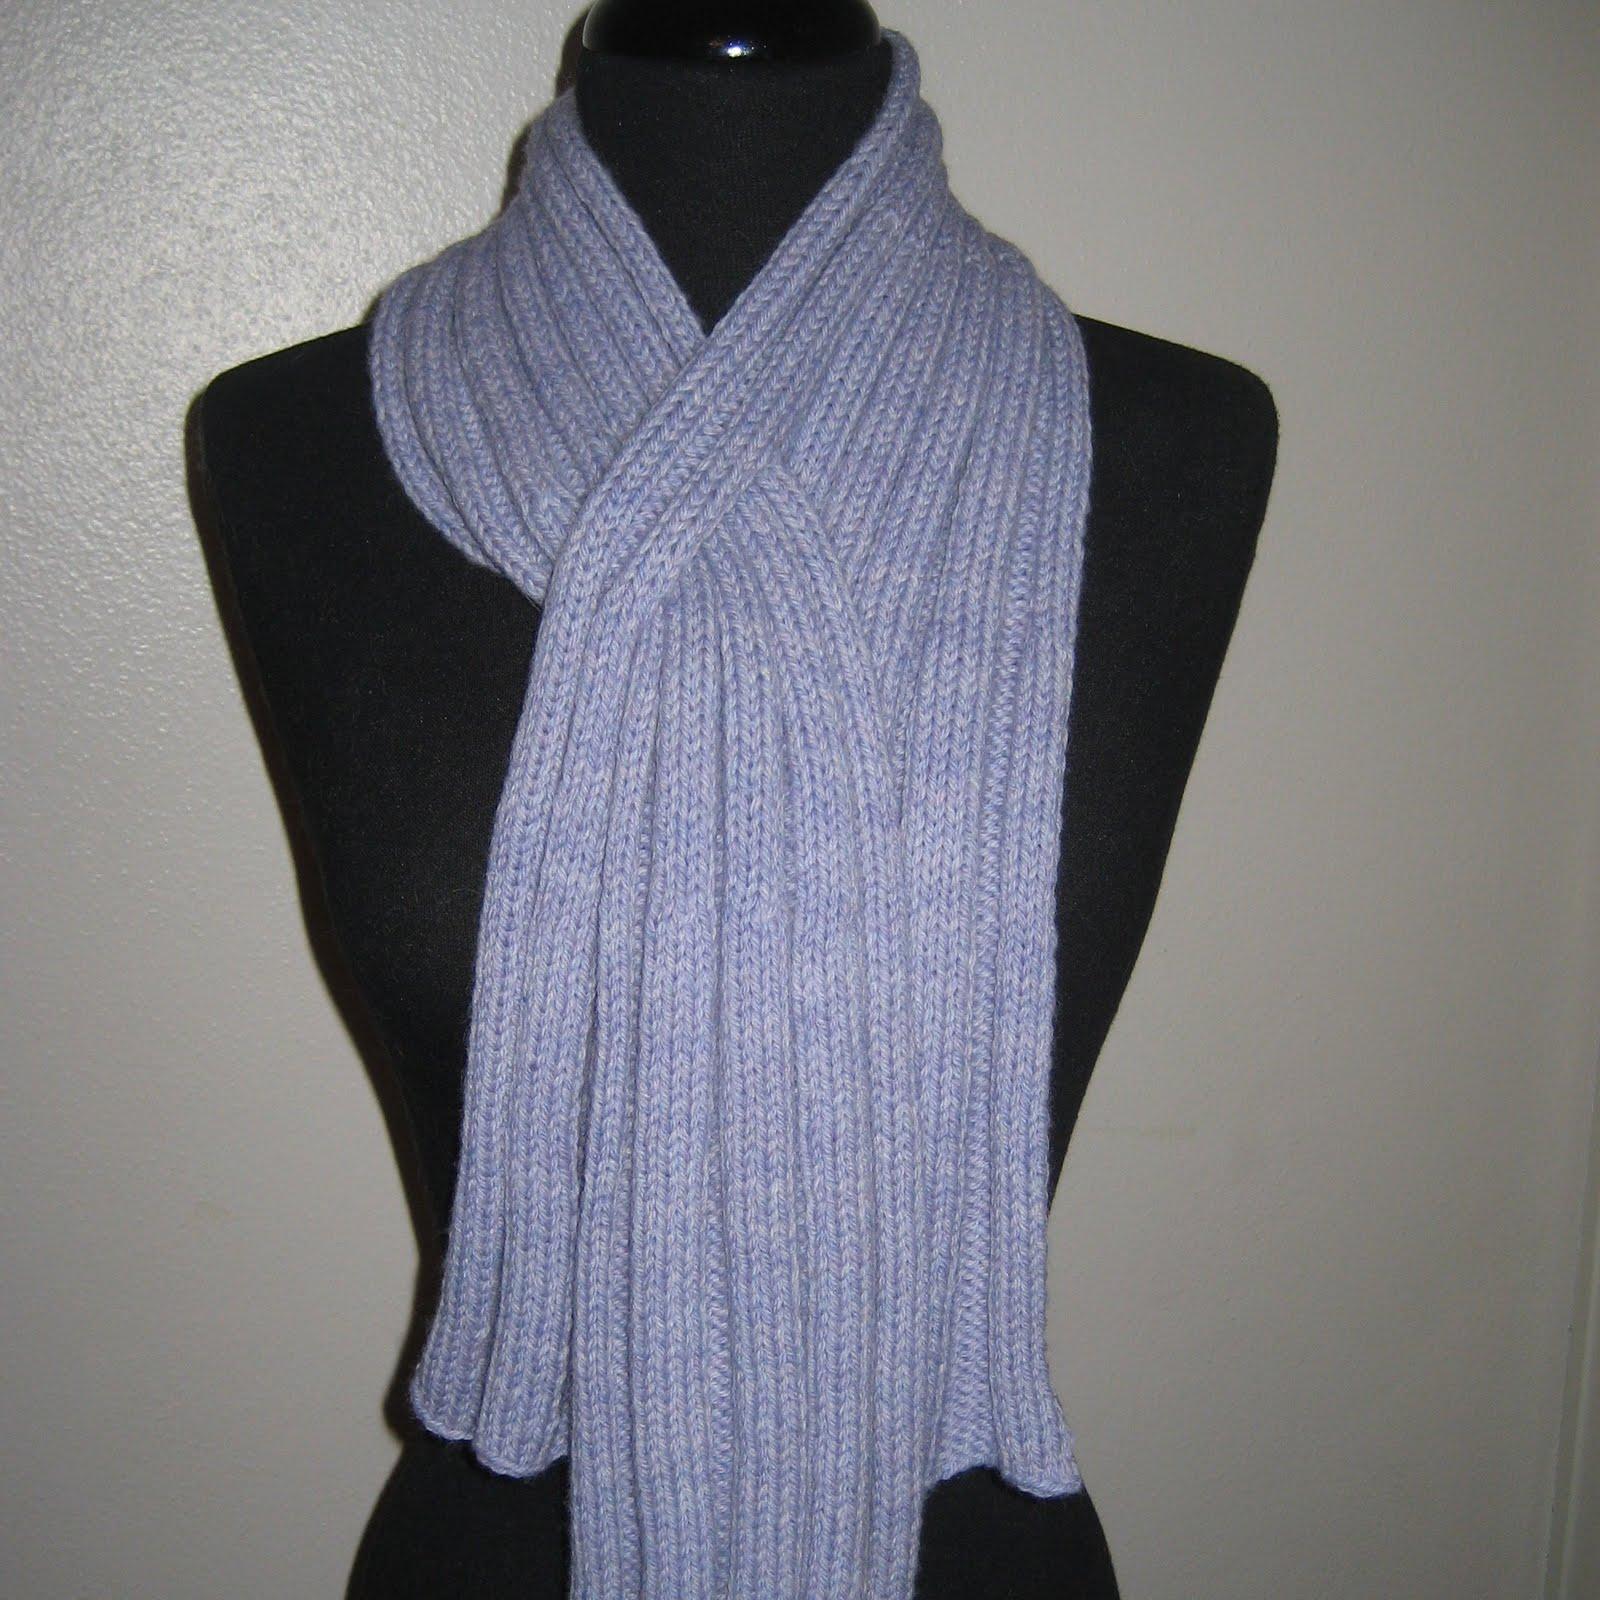 Knit Keyhole Scarf Pattern : Absolute Knits: Ribbed Keyhole Scarf